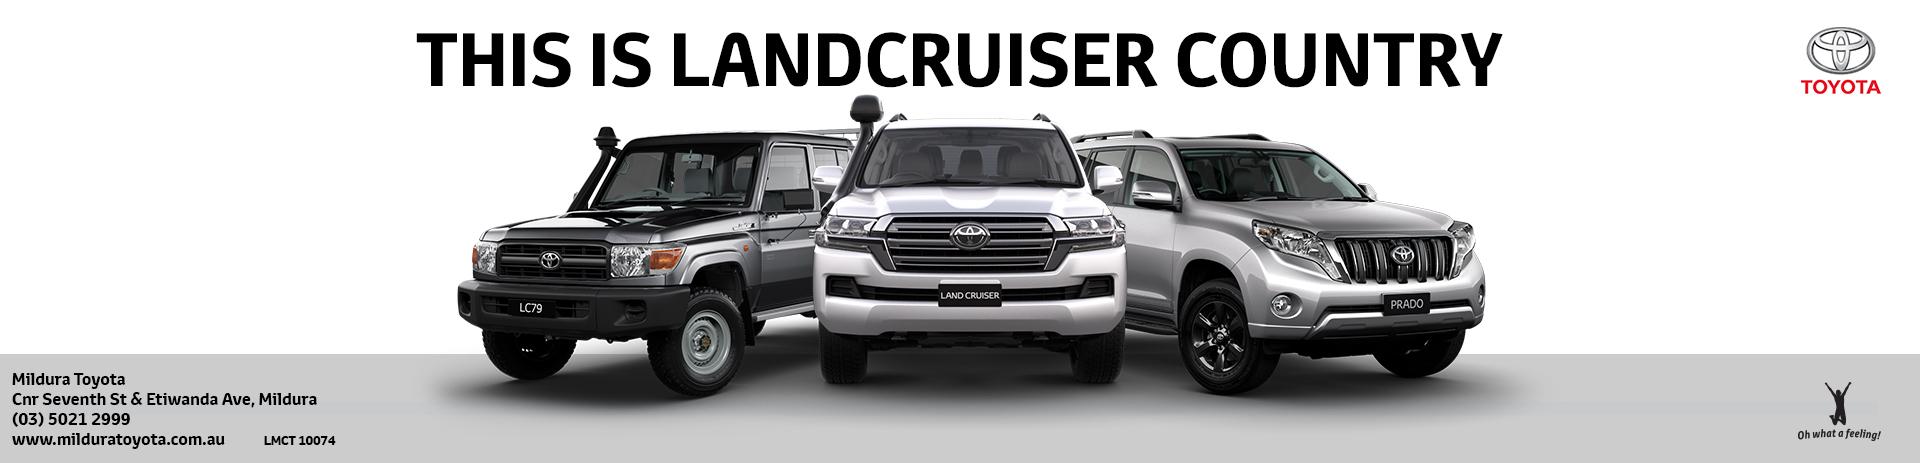 Mildura Toyota | Landcruiser